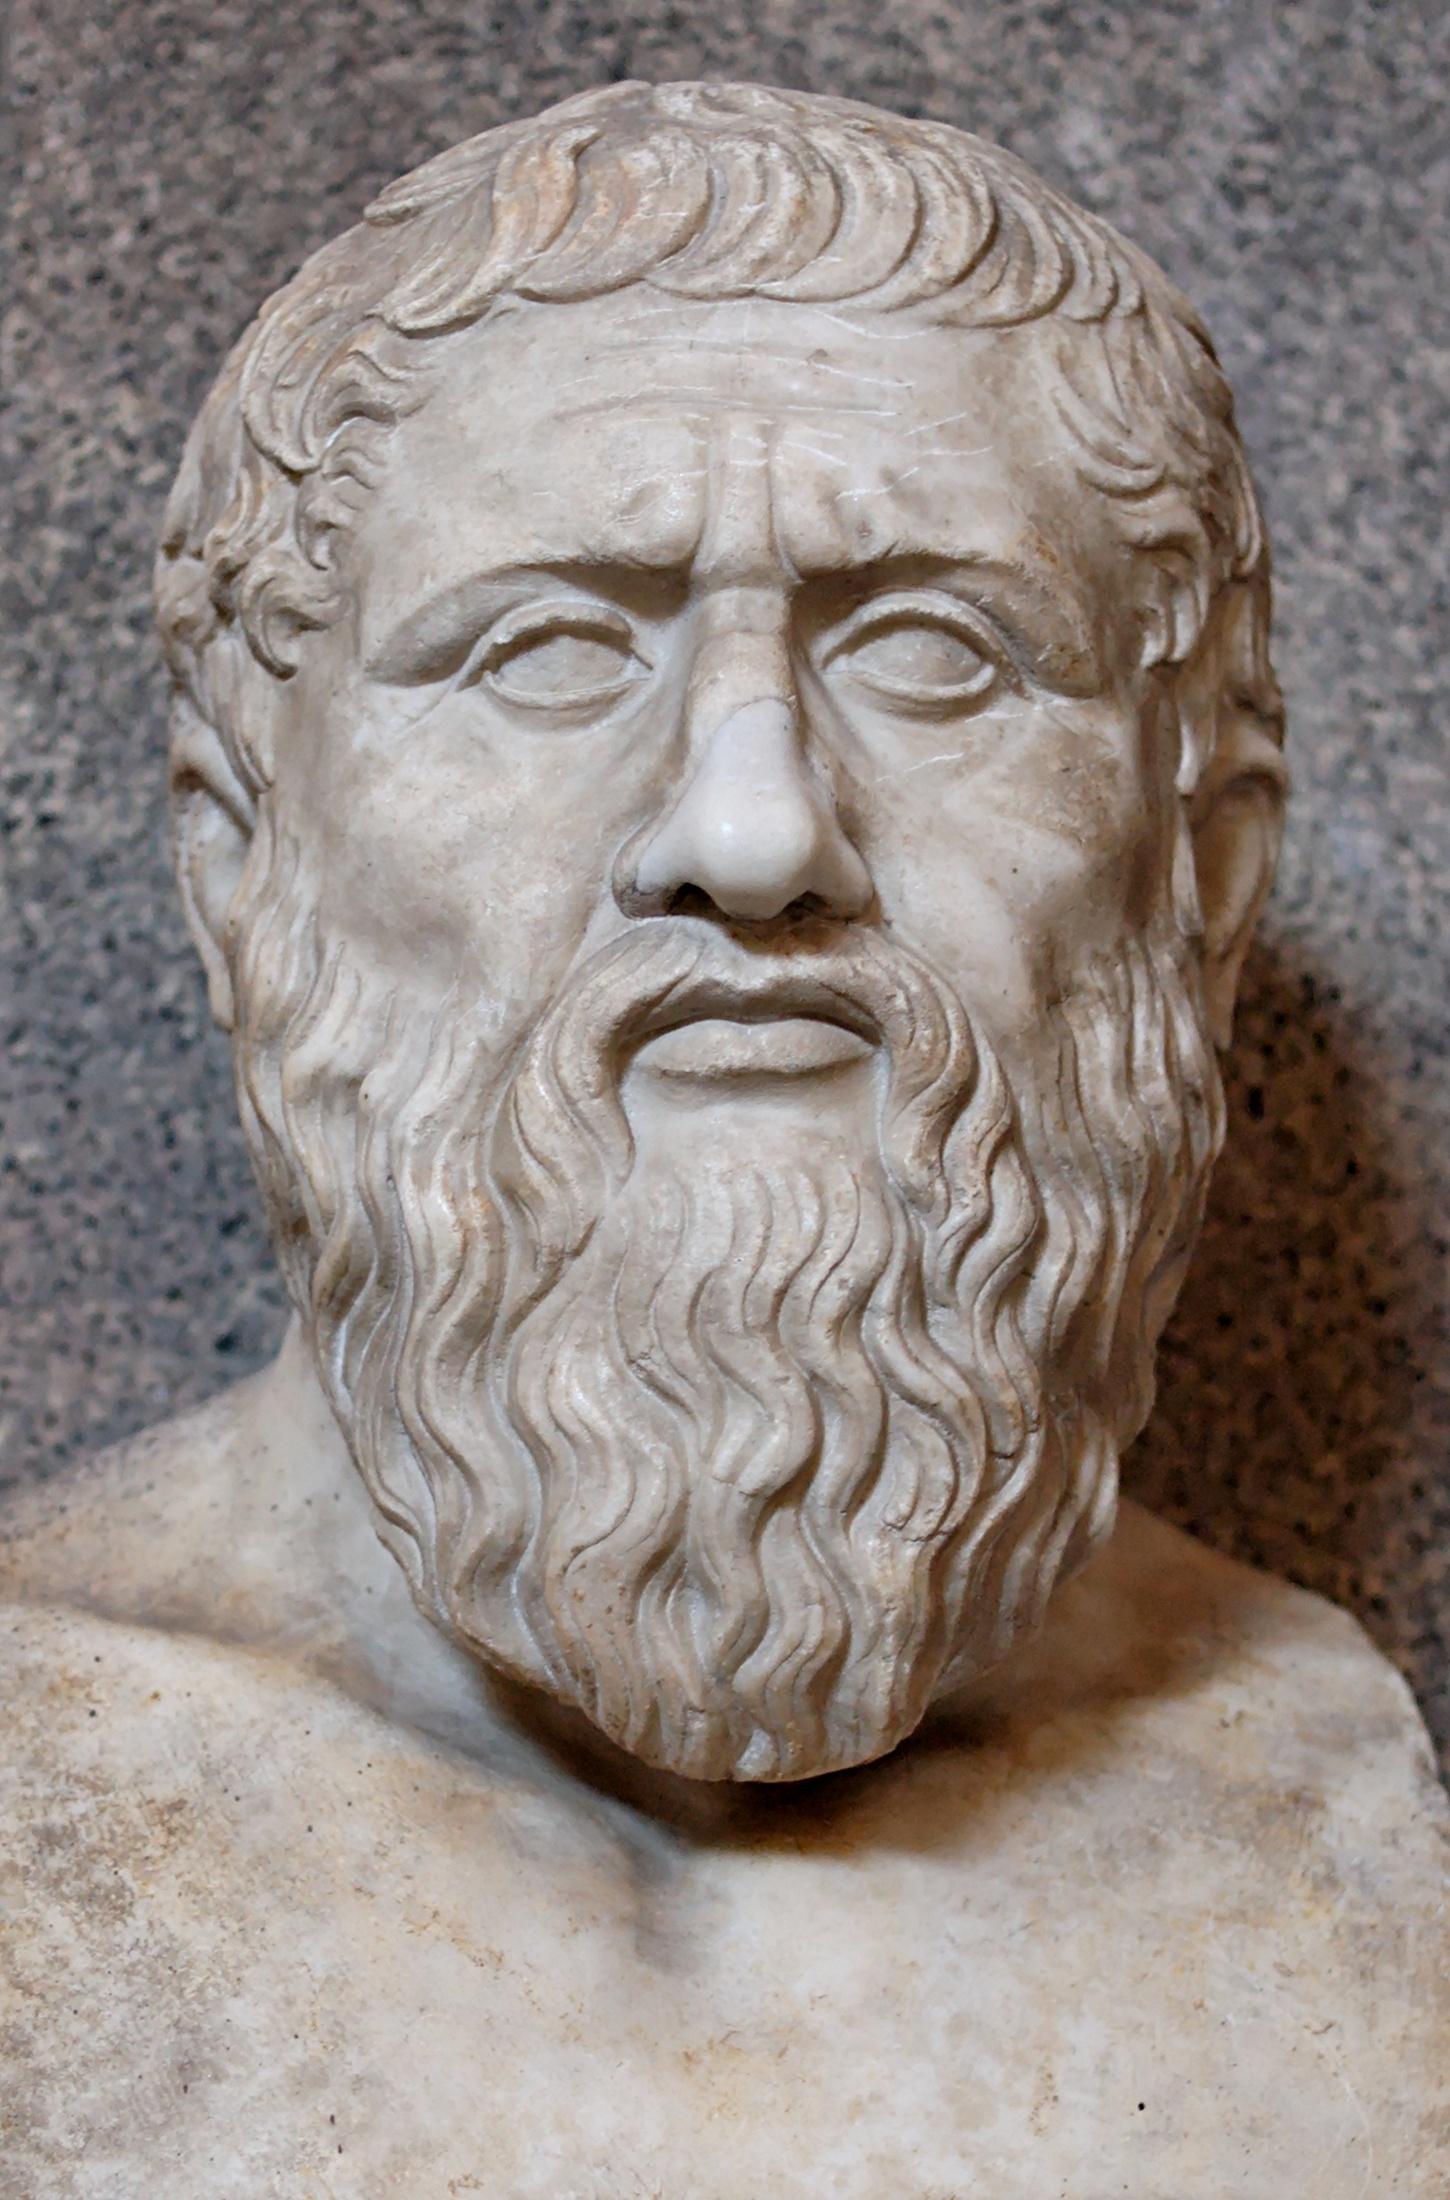 Plato-on-Sobriety